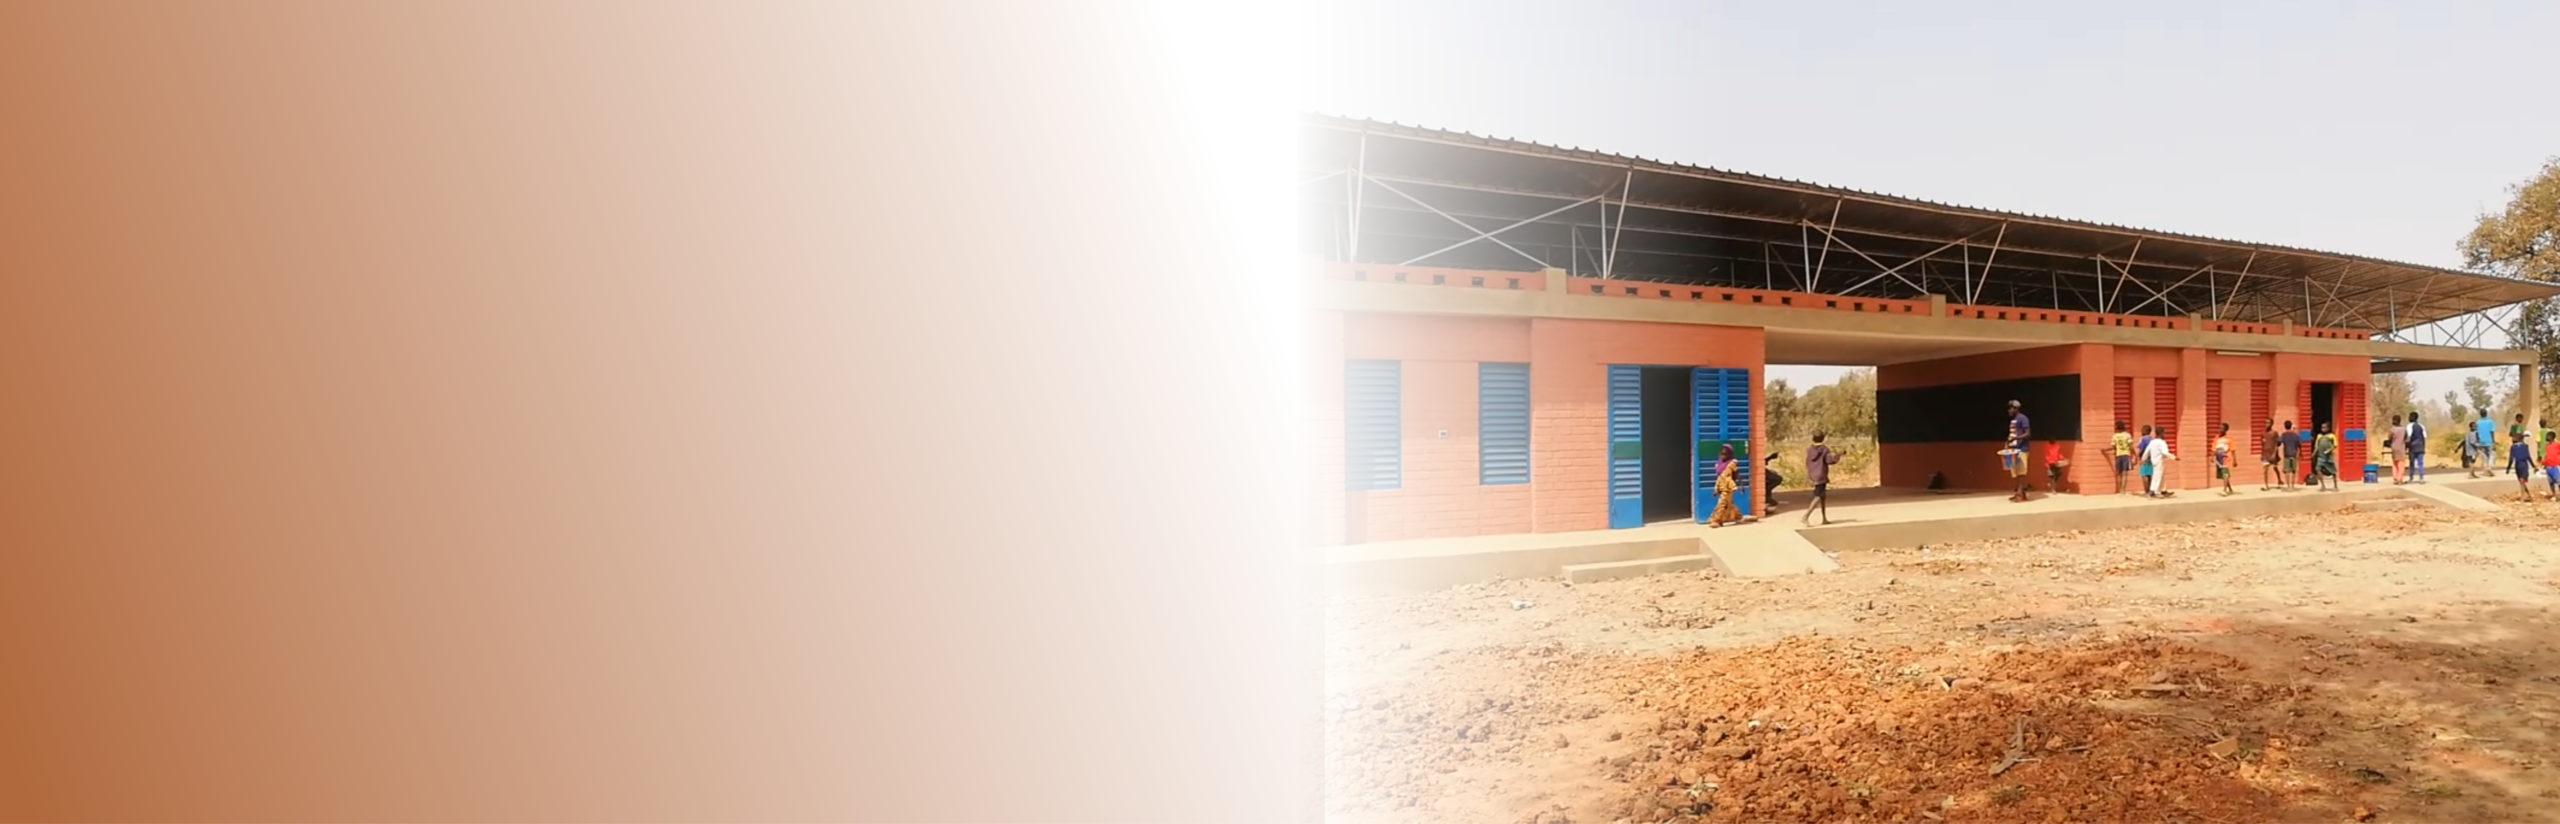 Schule in Burkina Faso